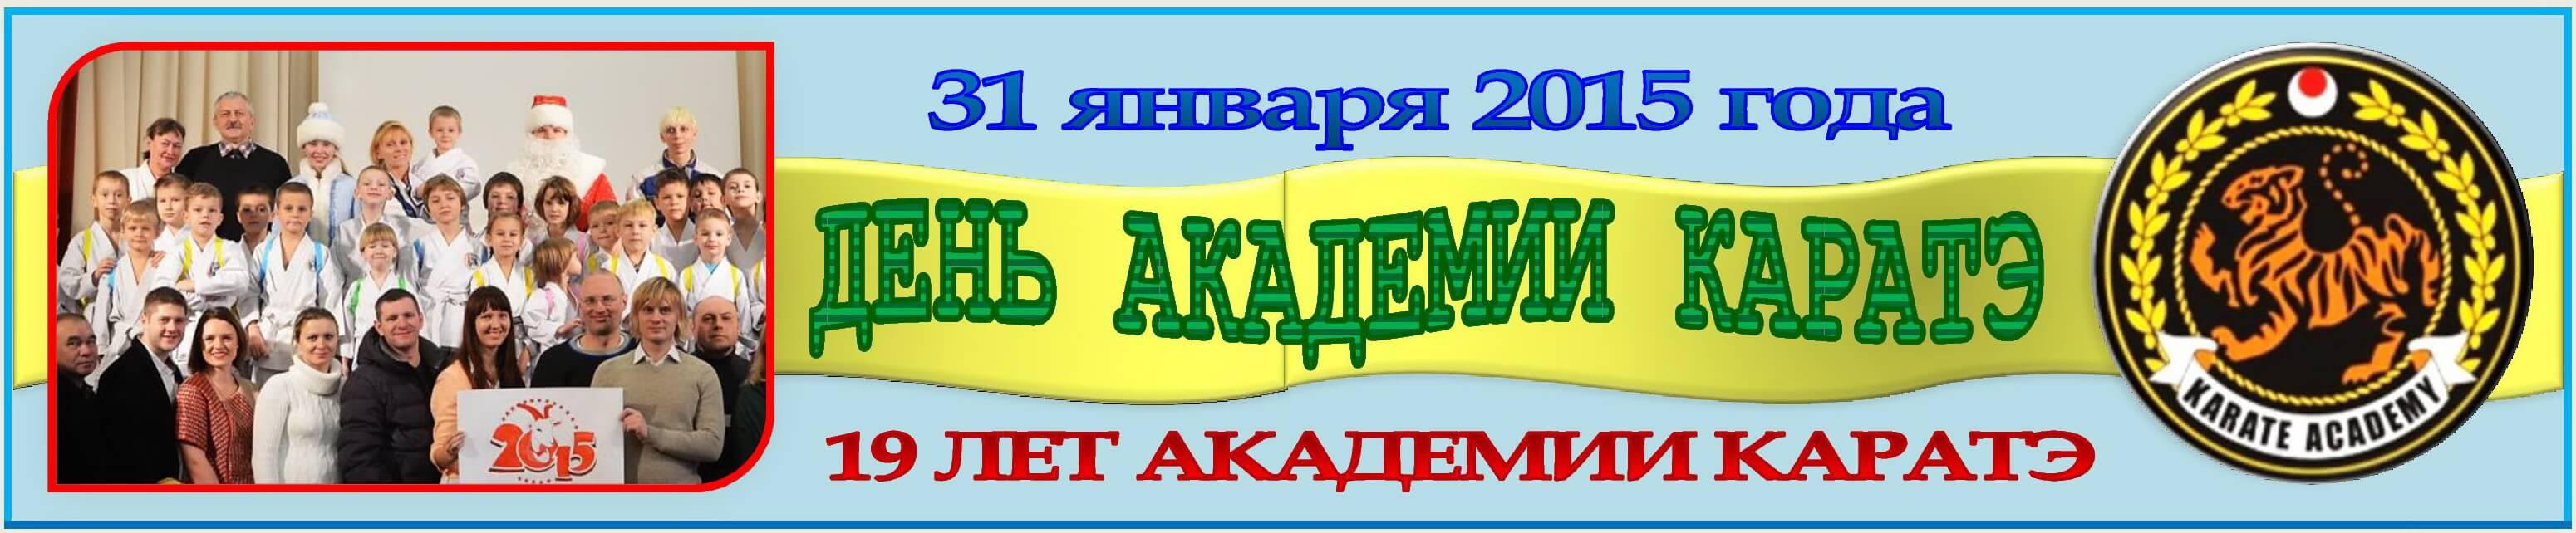 День Академии каратэ-2015 Баннер